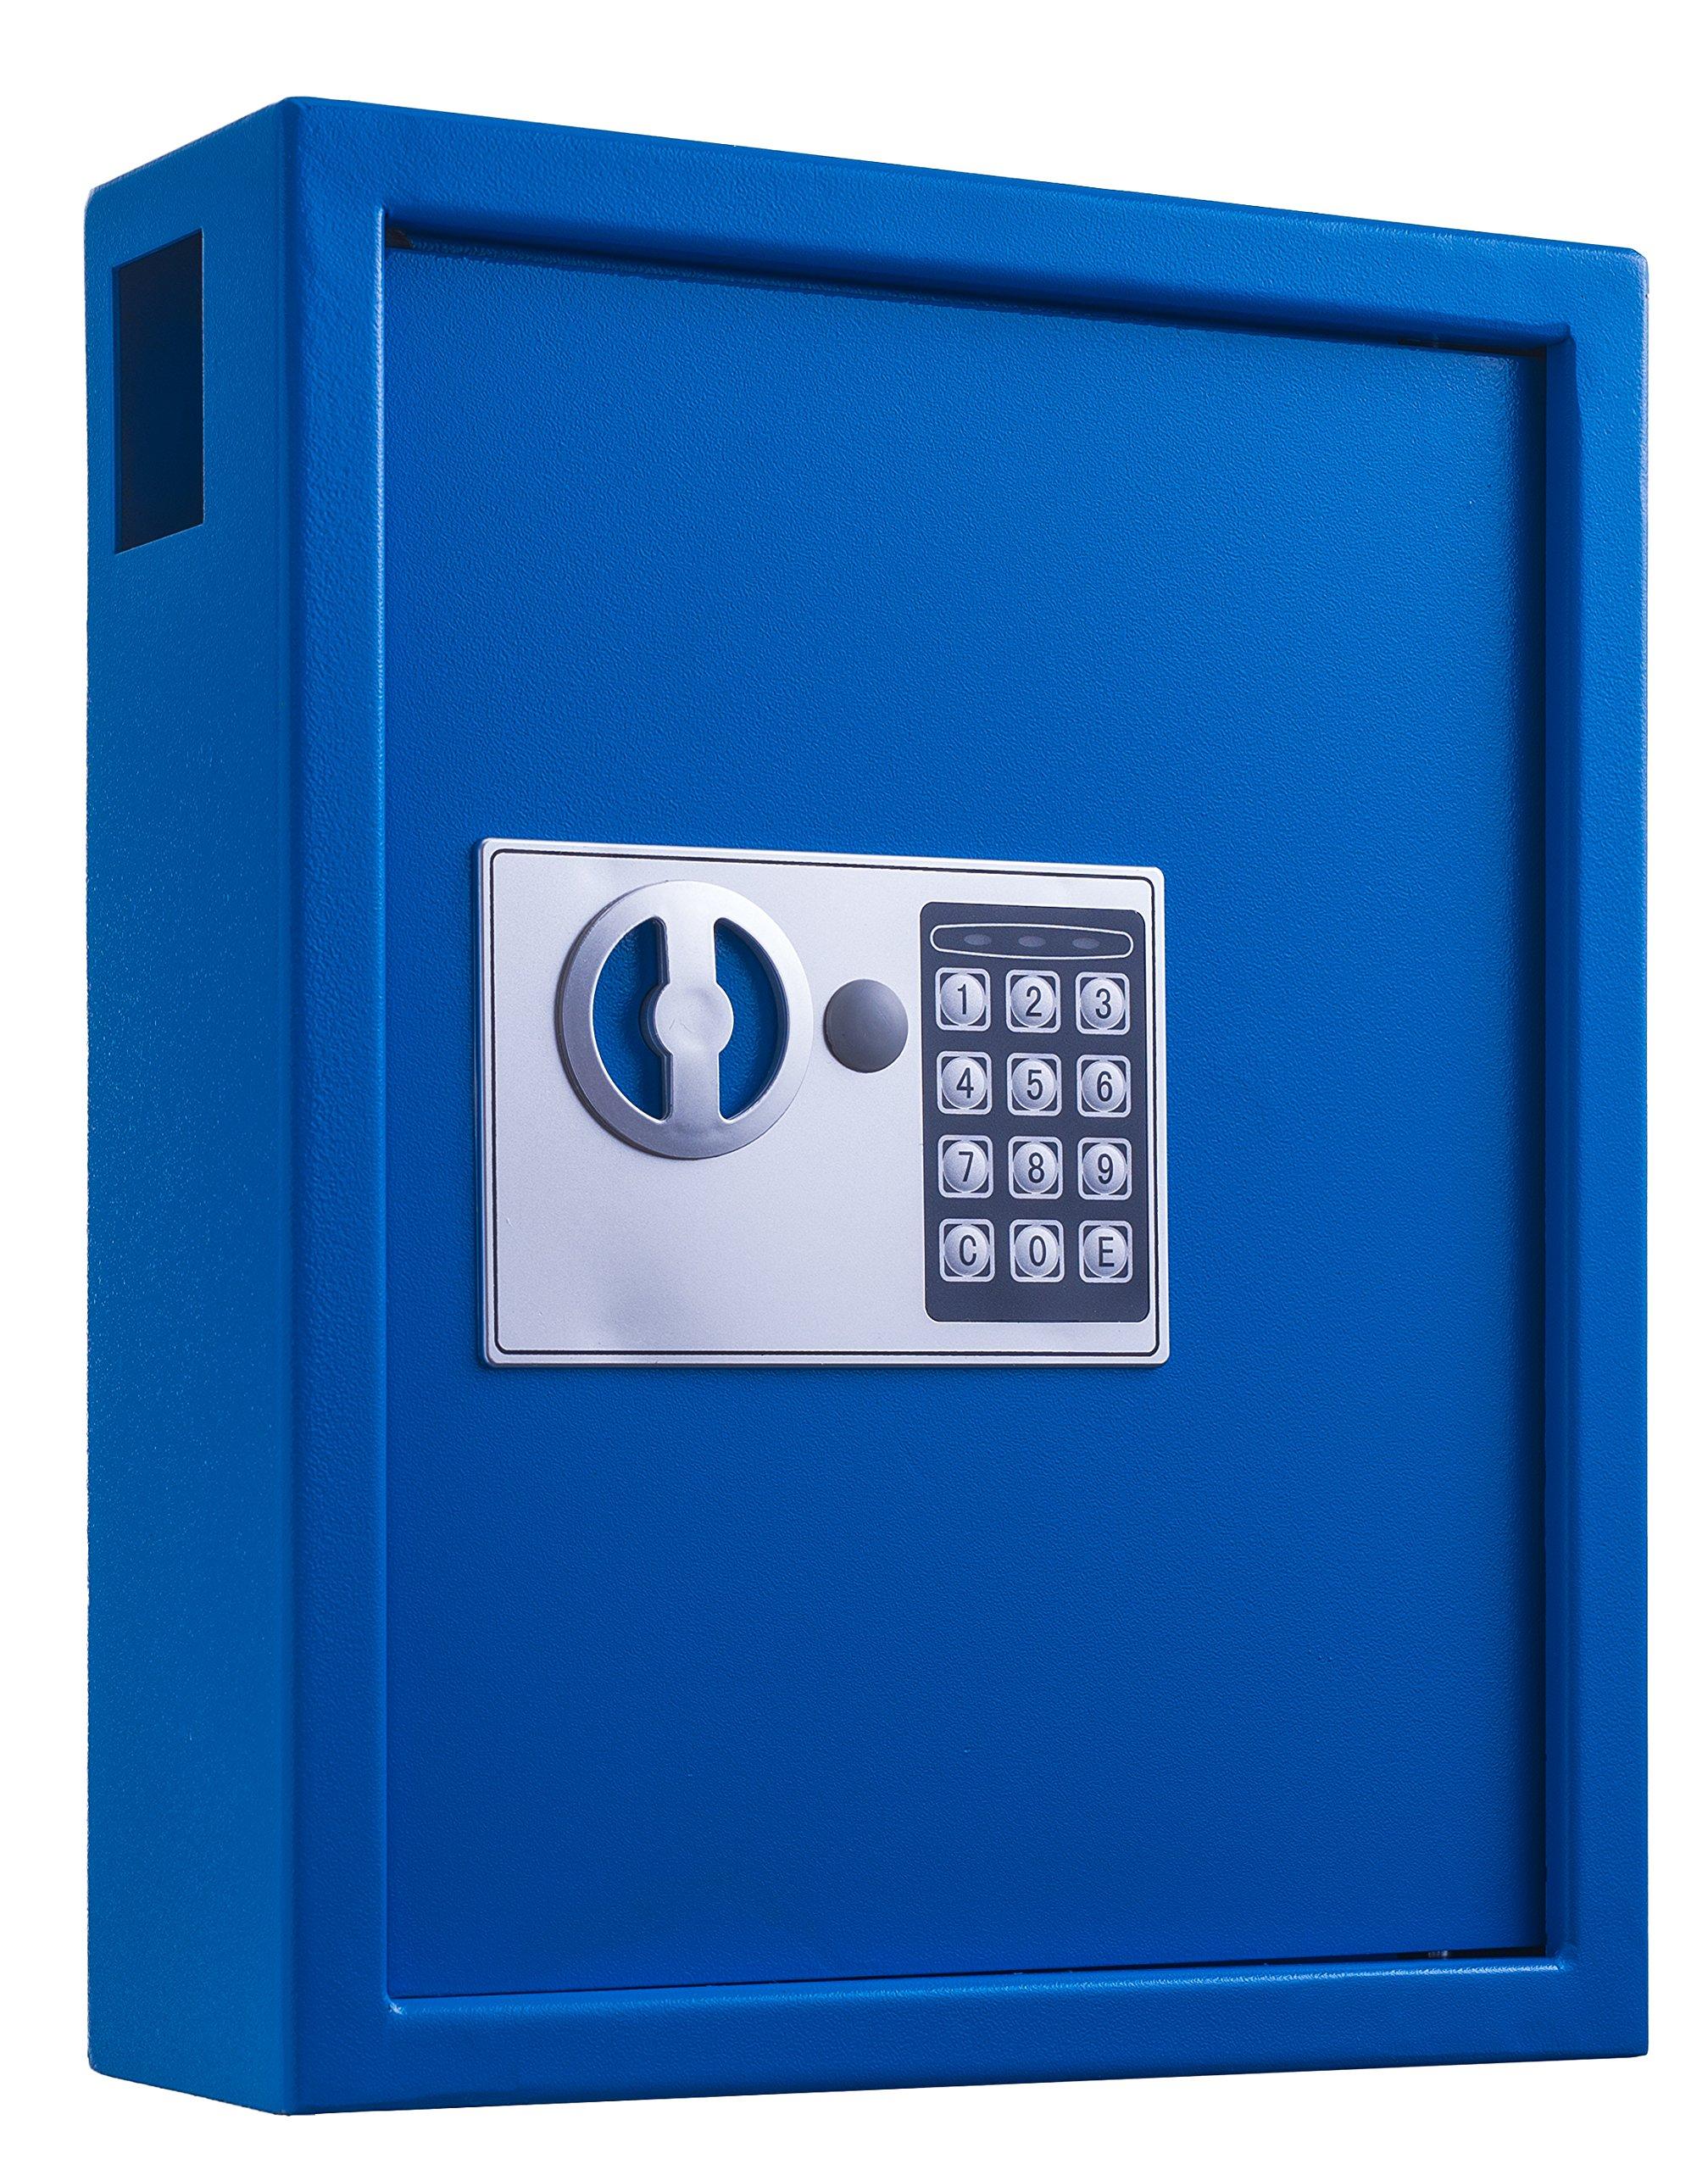 AdirOffice 40 Keys Cabinet with Digital Lock - Electronic Key Safe - Pin Code Keyless Storage Box for Keys - Secure Steel Lockbox - Scratch Resistant Powder Coated - Wall Anchor (Blue) by AdirOffice